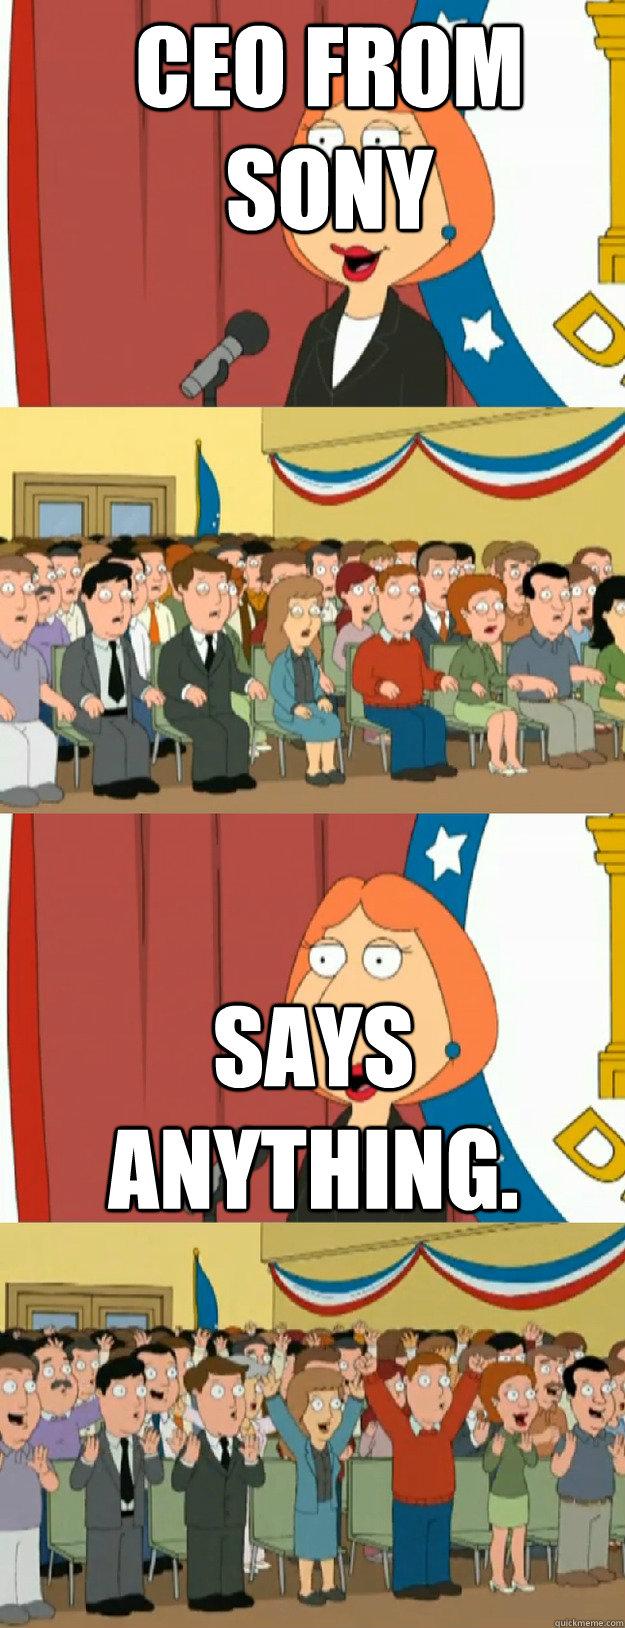 Patrick Pewterschmidt | Family Guy Wiki | FANDOM powered